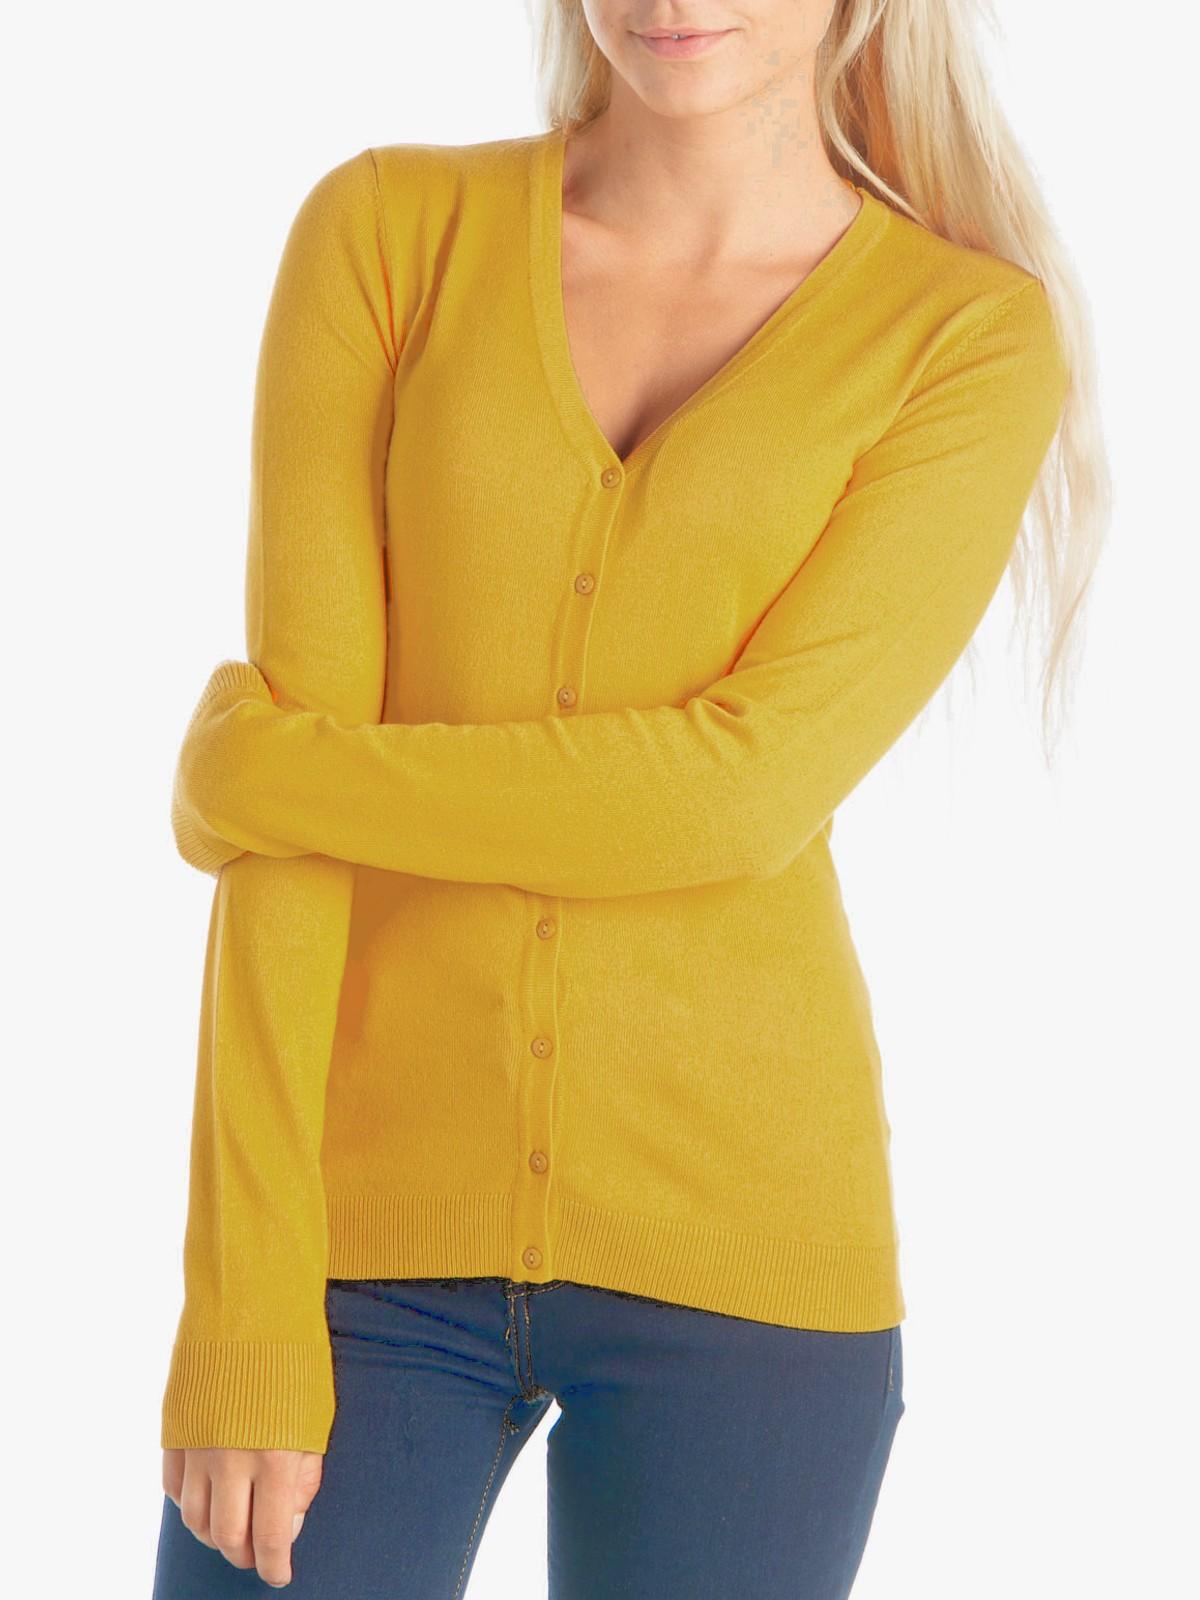 gilet jaune boutons basique pour femme districenter. Black Bedroom Furniture Sets. Home Design Ideas